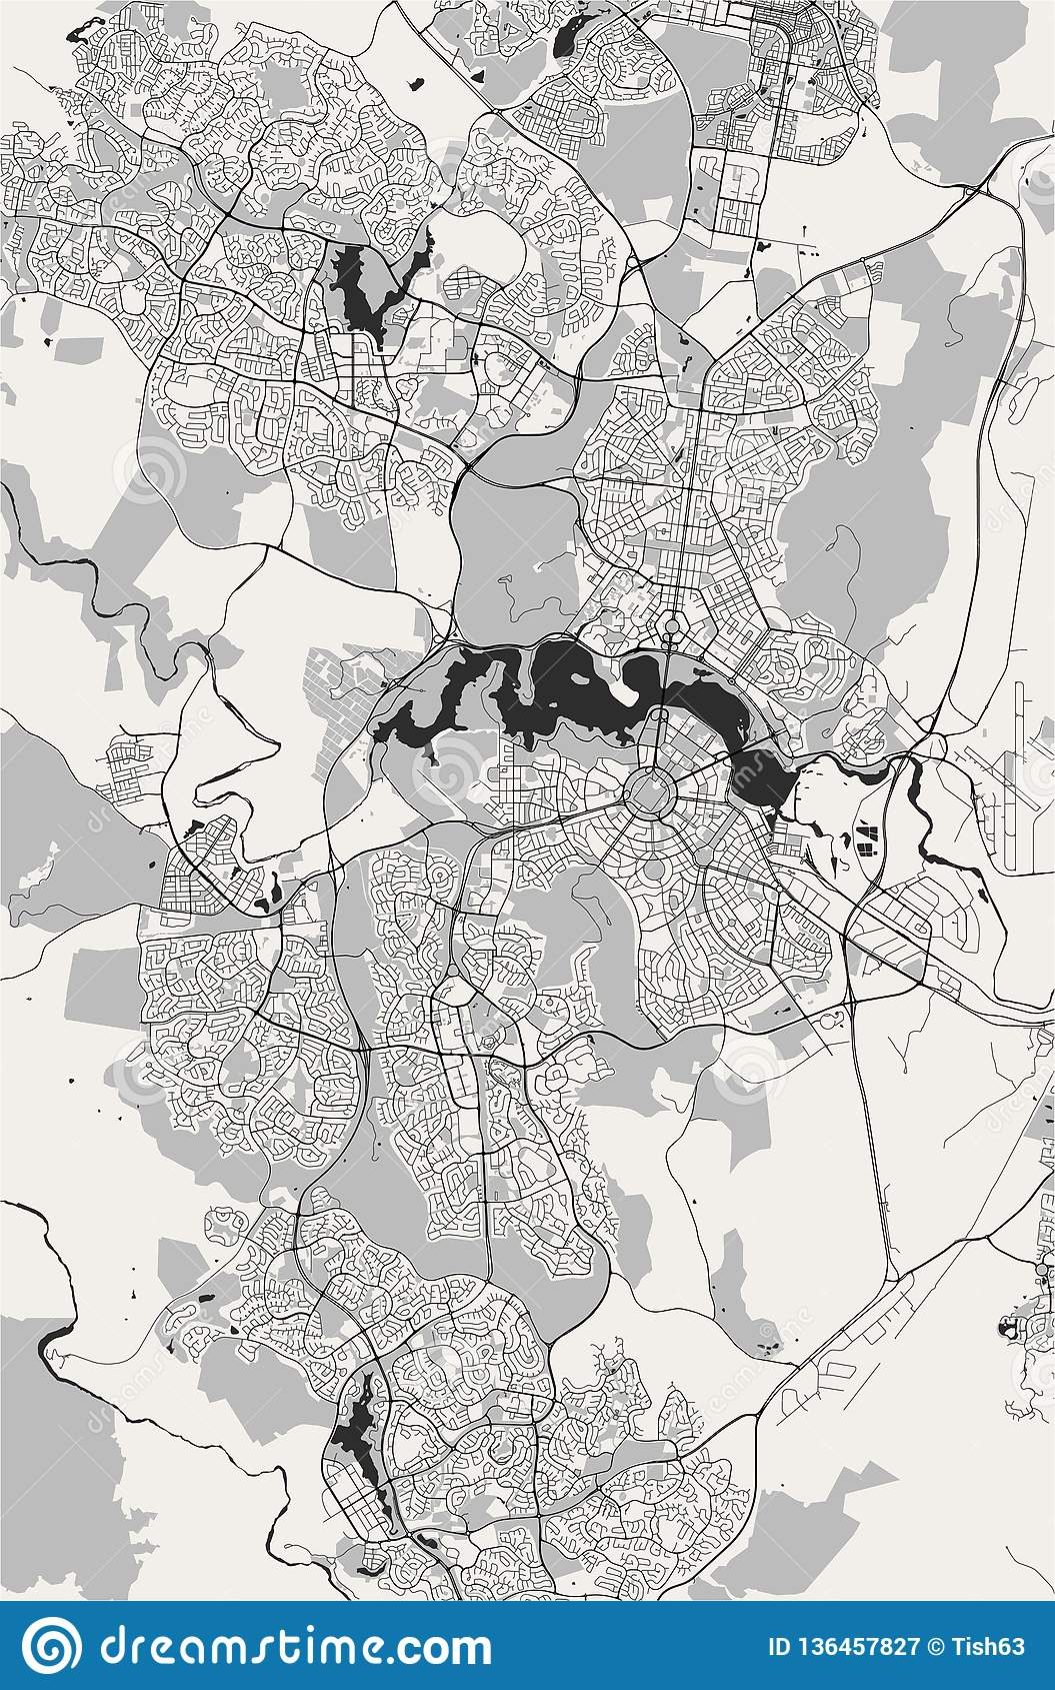 Map of the city of Canberra, Australian Capital Territory, Australia